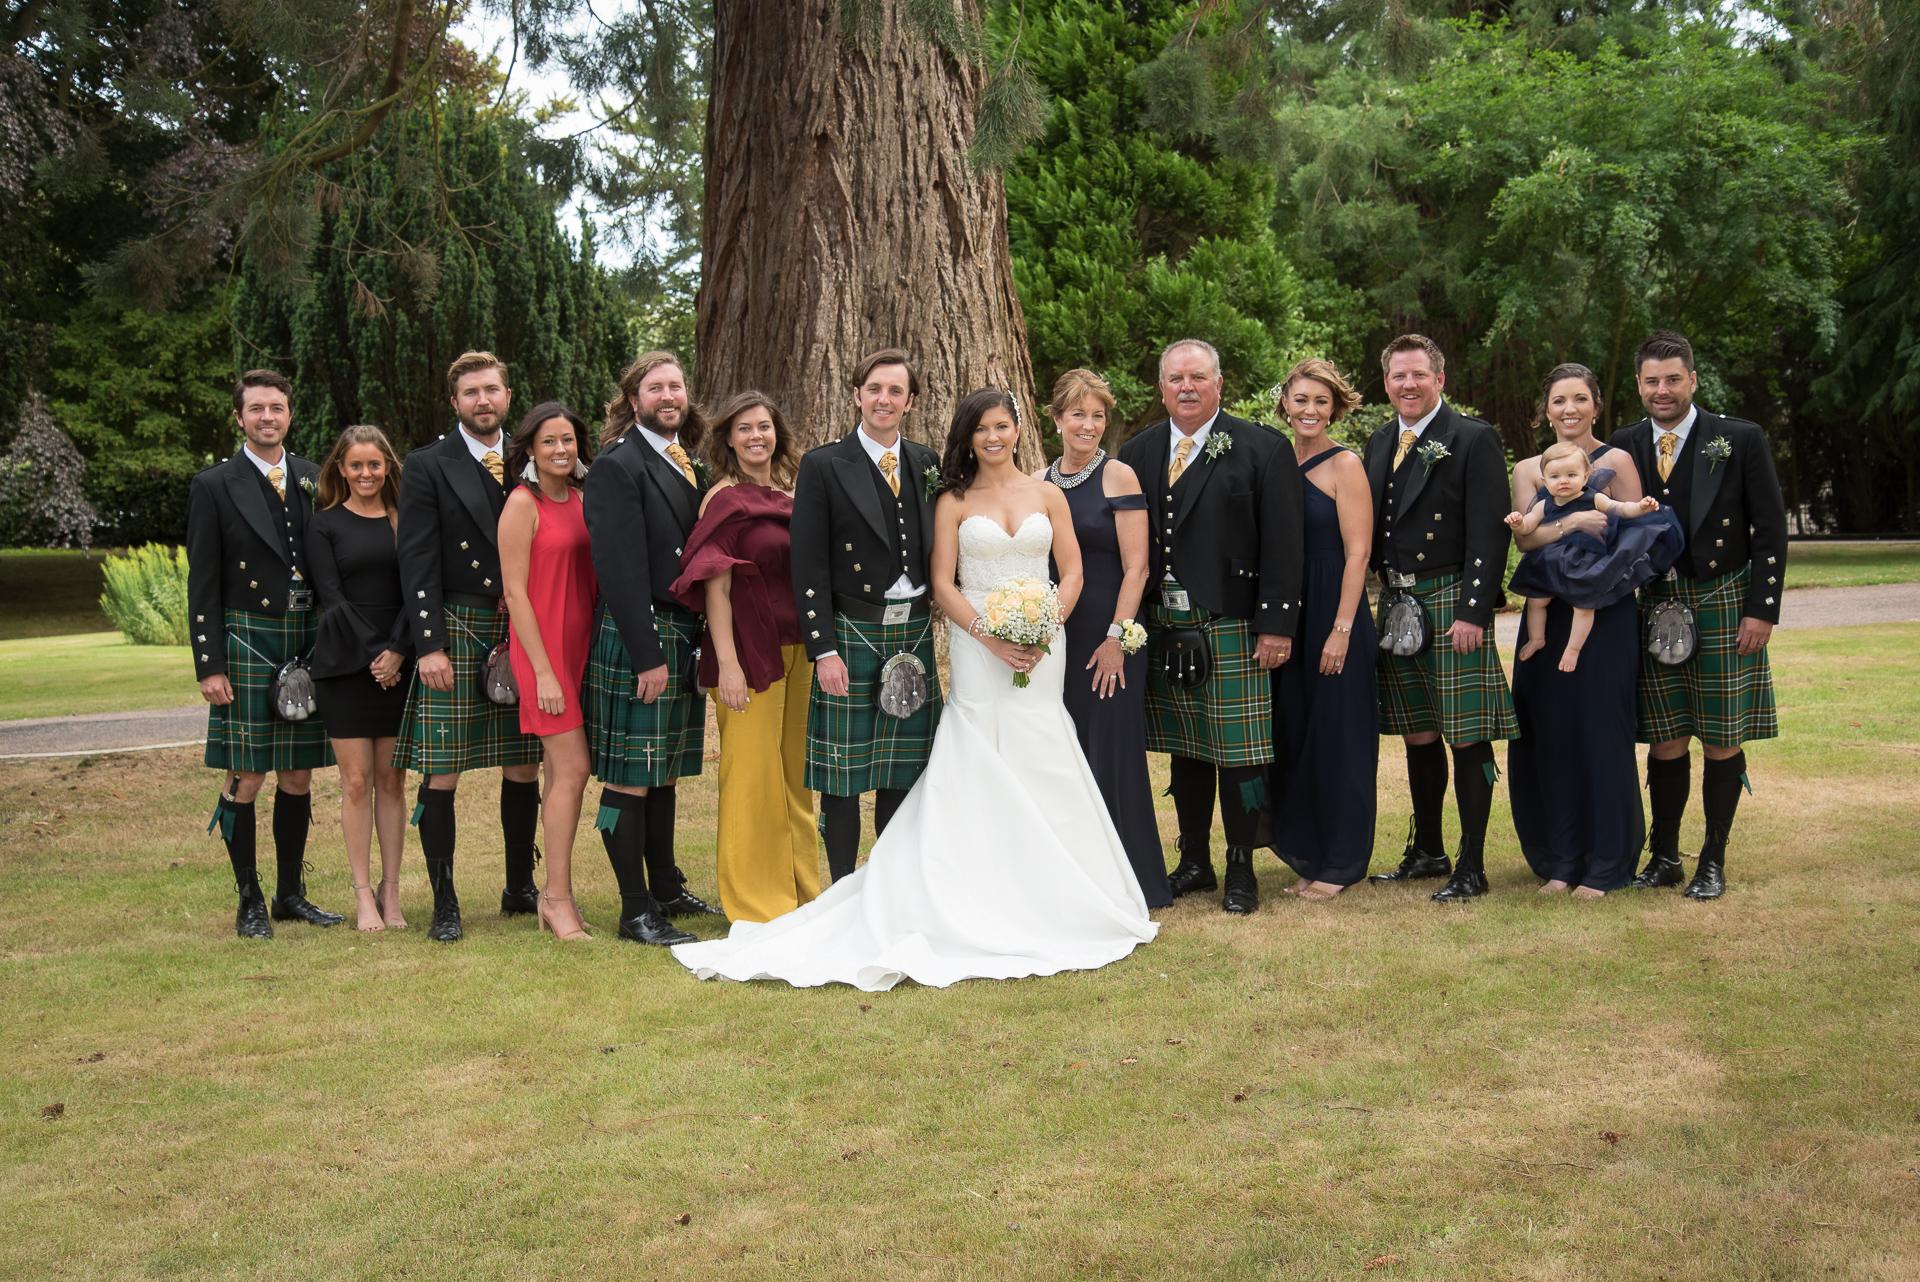 Paul and Meghan at Huntingtower Hotel Perth, the Bride and Bridesmaids 2